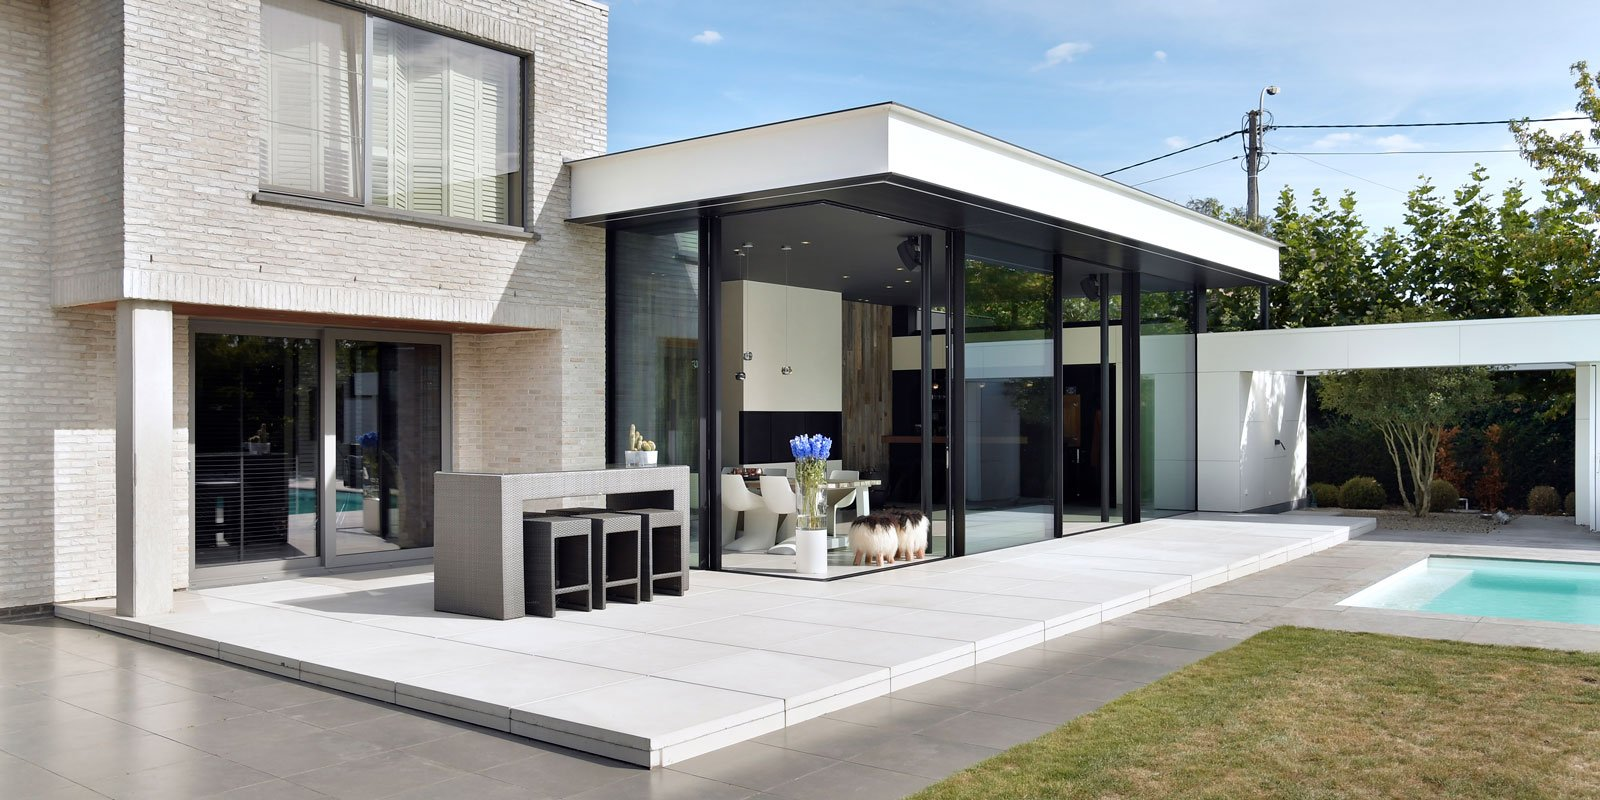 De tuinkamer, Tail Architectuur, the art of living